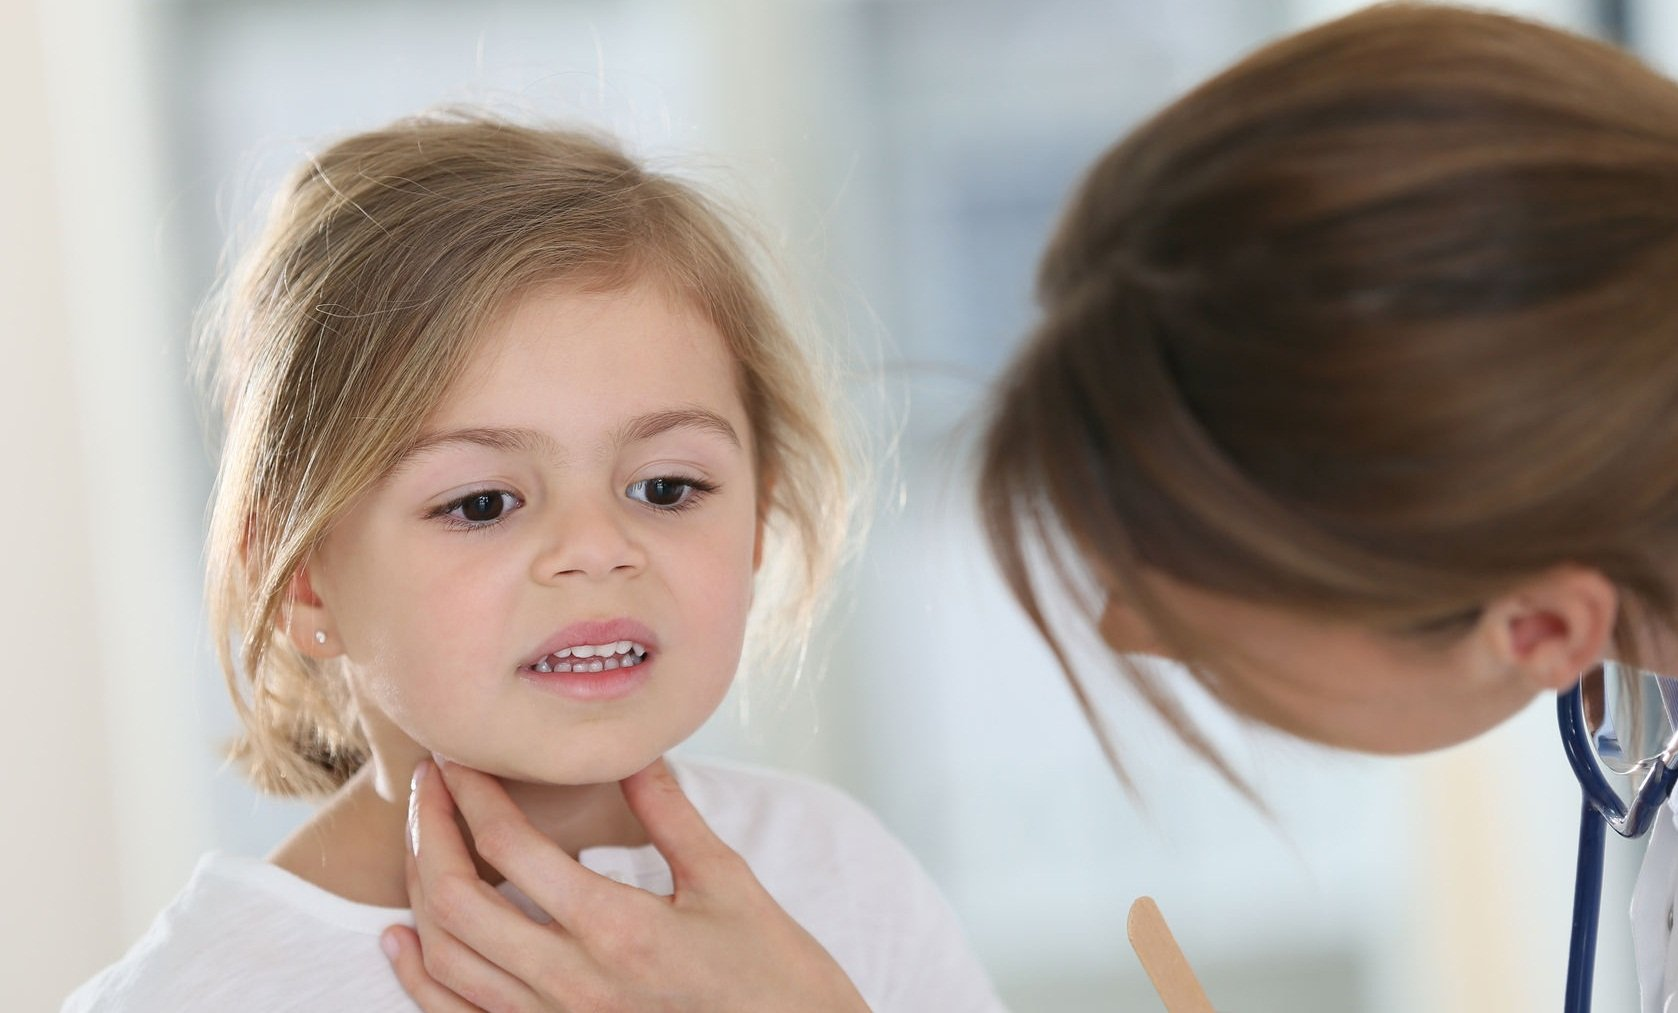 Опухшие миндалины фото